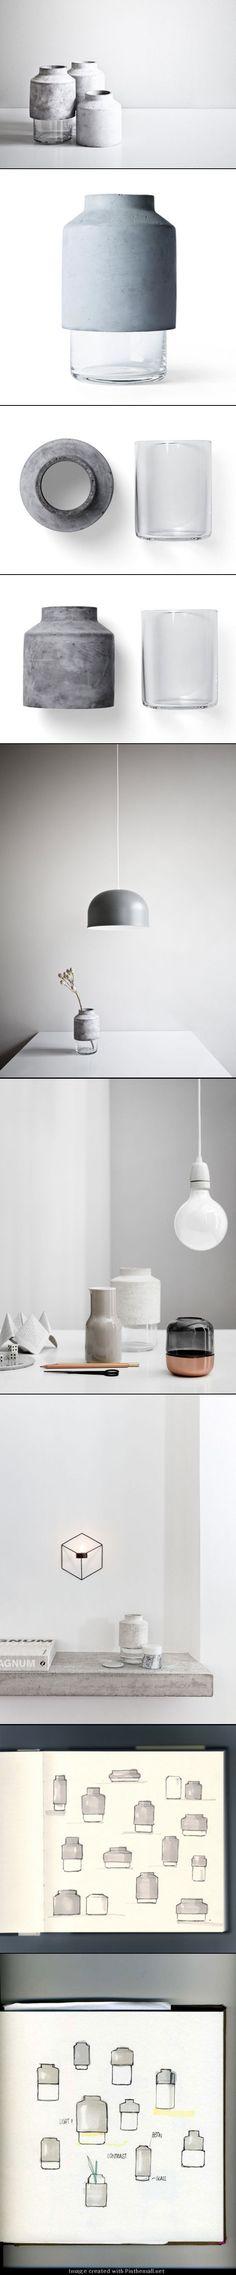 Concrete Vase/Beton Design